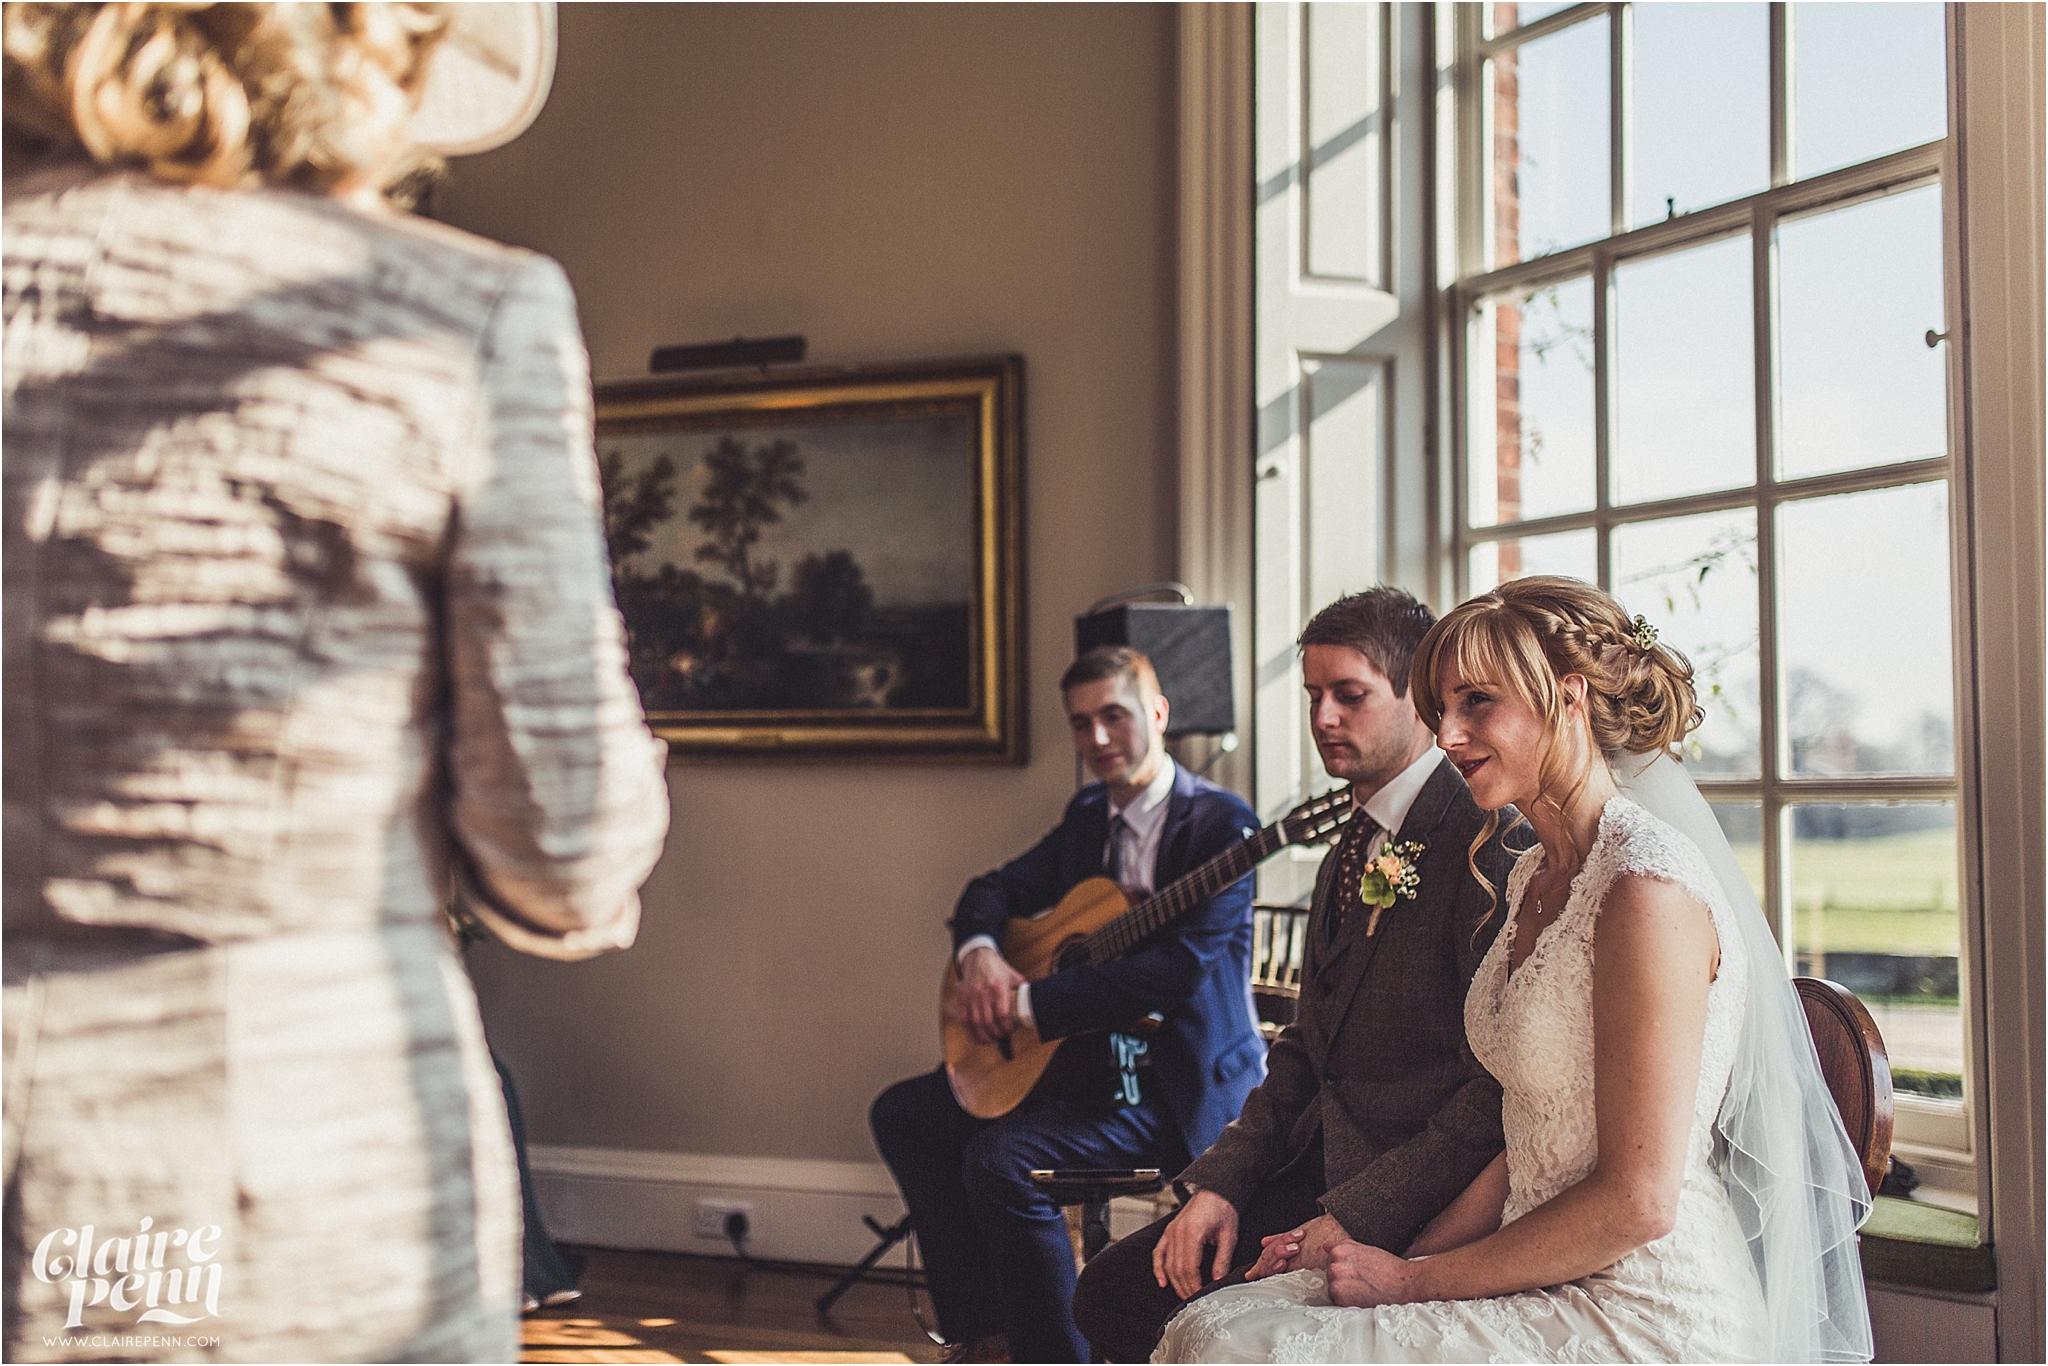 Iscoyd Park wedding, Whitchurch, Cheshire wedding photographer_0019.jpg